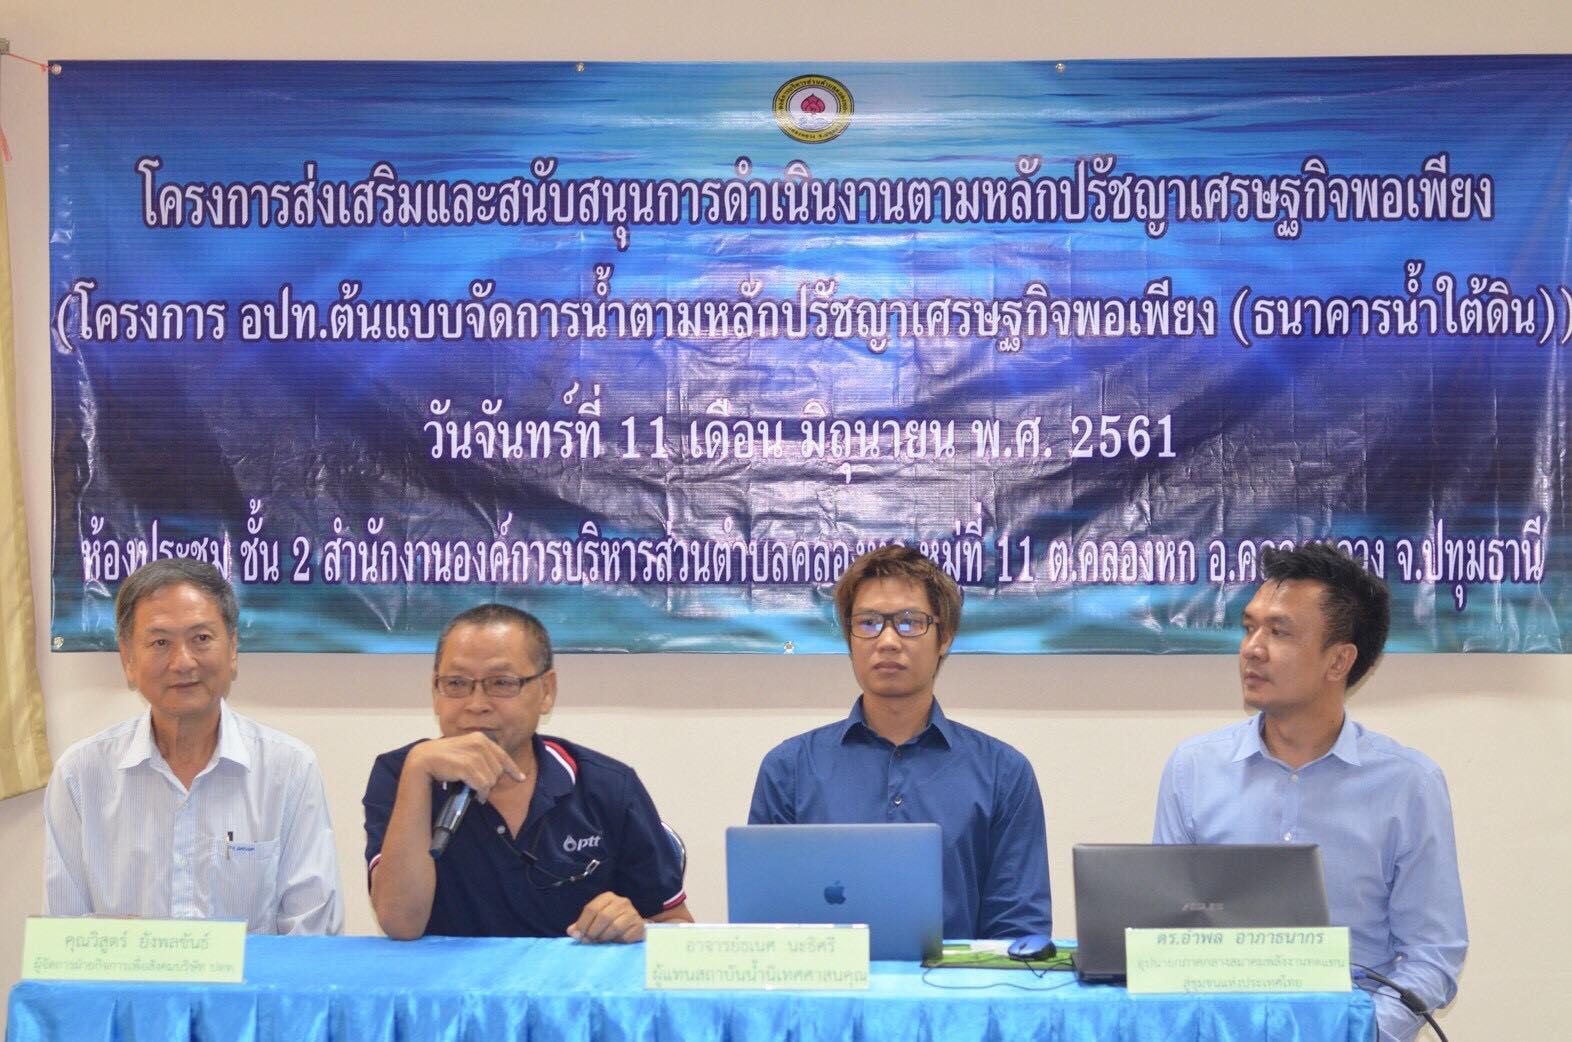 thailad 9.jpg